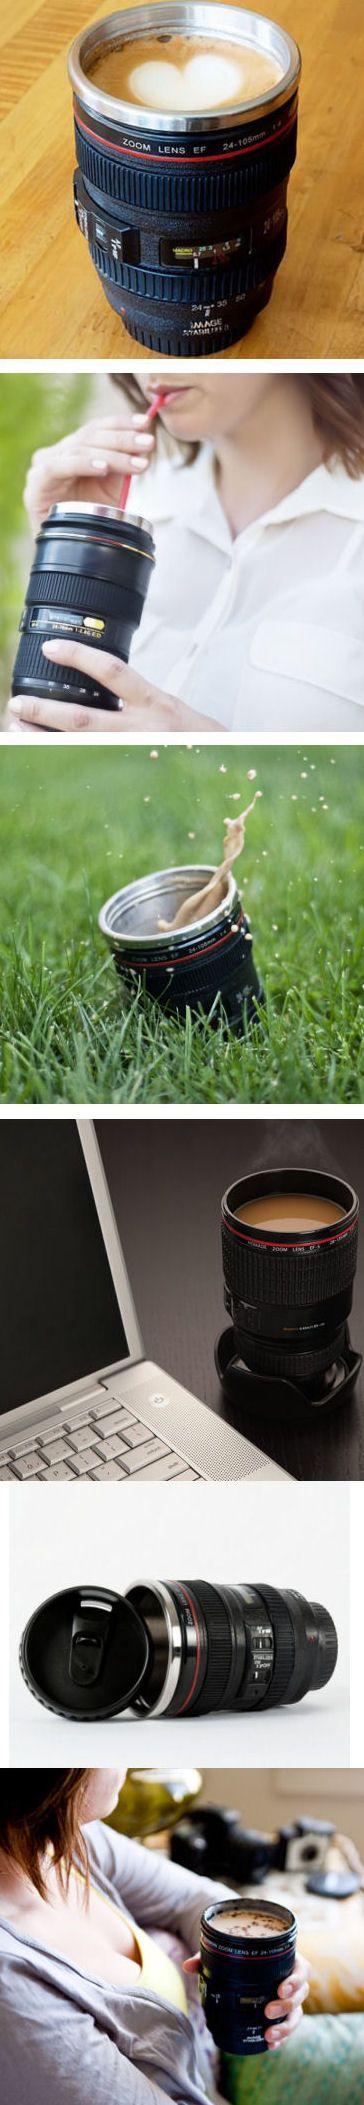 Best Camera Lens Mug Images On Pinterest Camera Lens - Nikon coffee cup lens